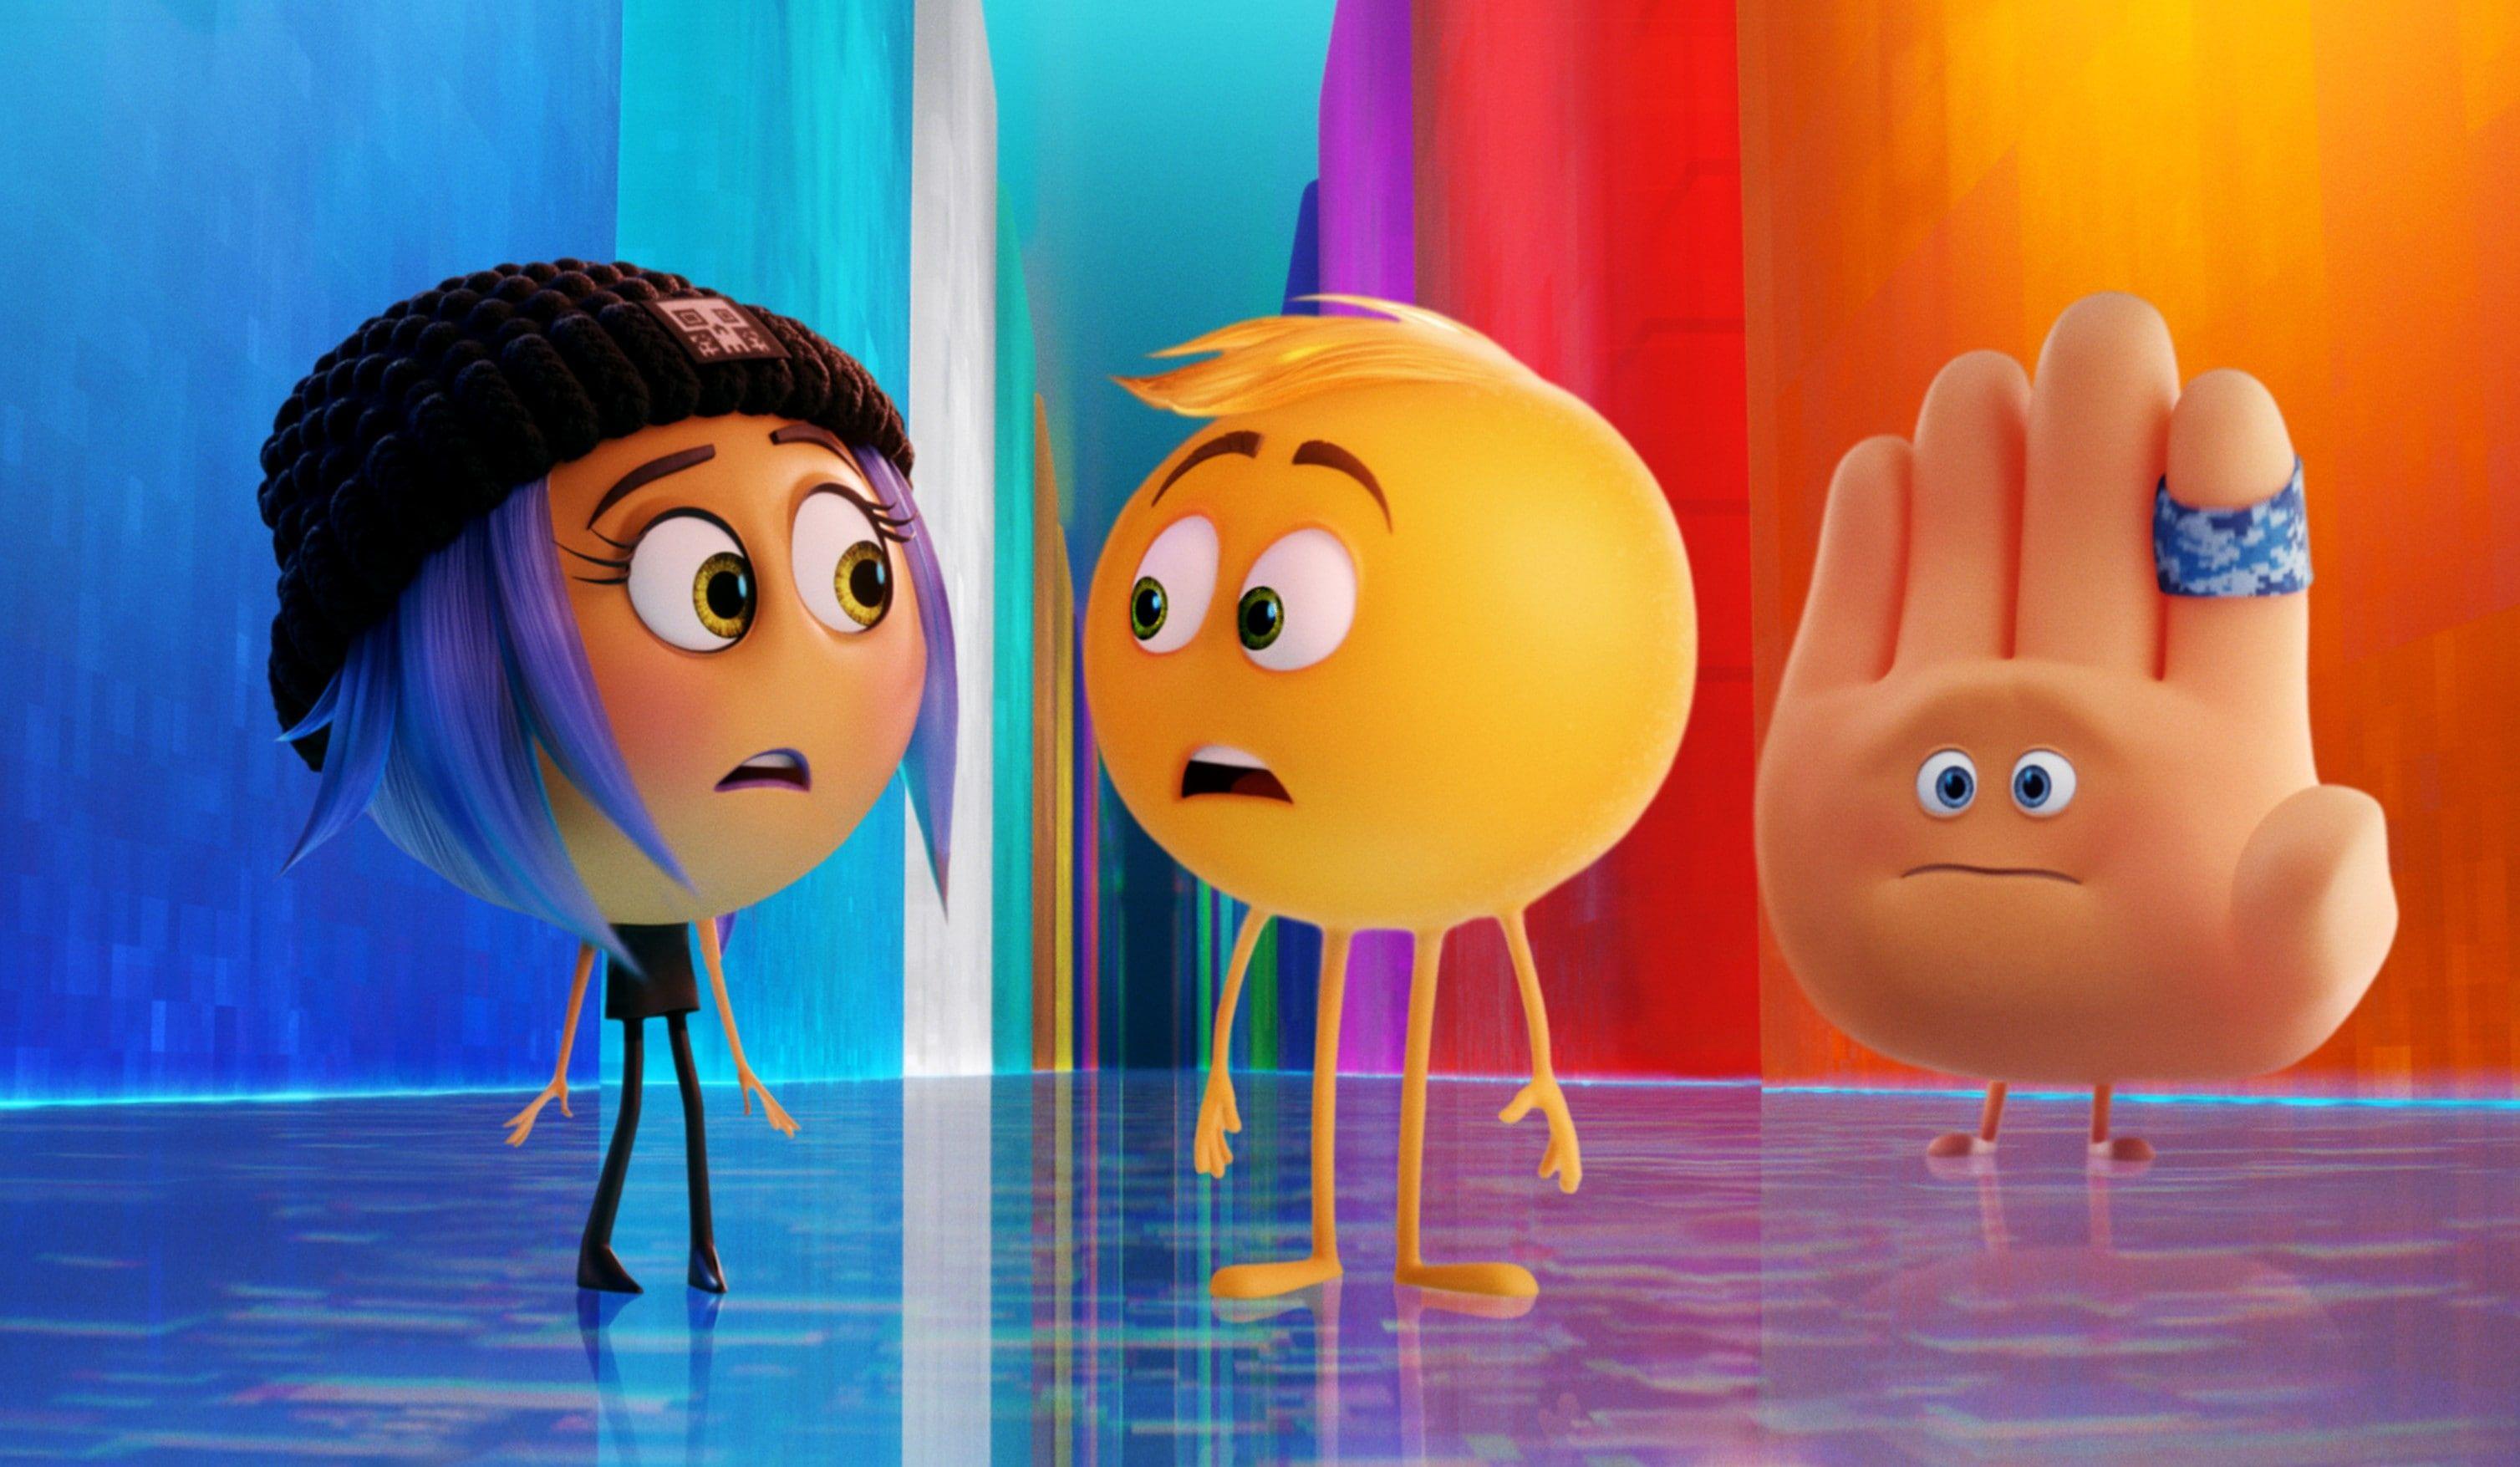 2017 The Emoji Movie Animation Jailbreak Gene Hi 5 2k Wallpaper Hdwallpaper Desktop In 2020 Emoji Movie Emoji Animation